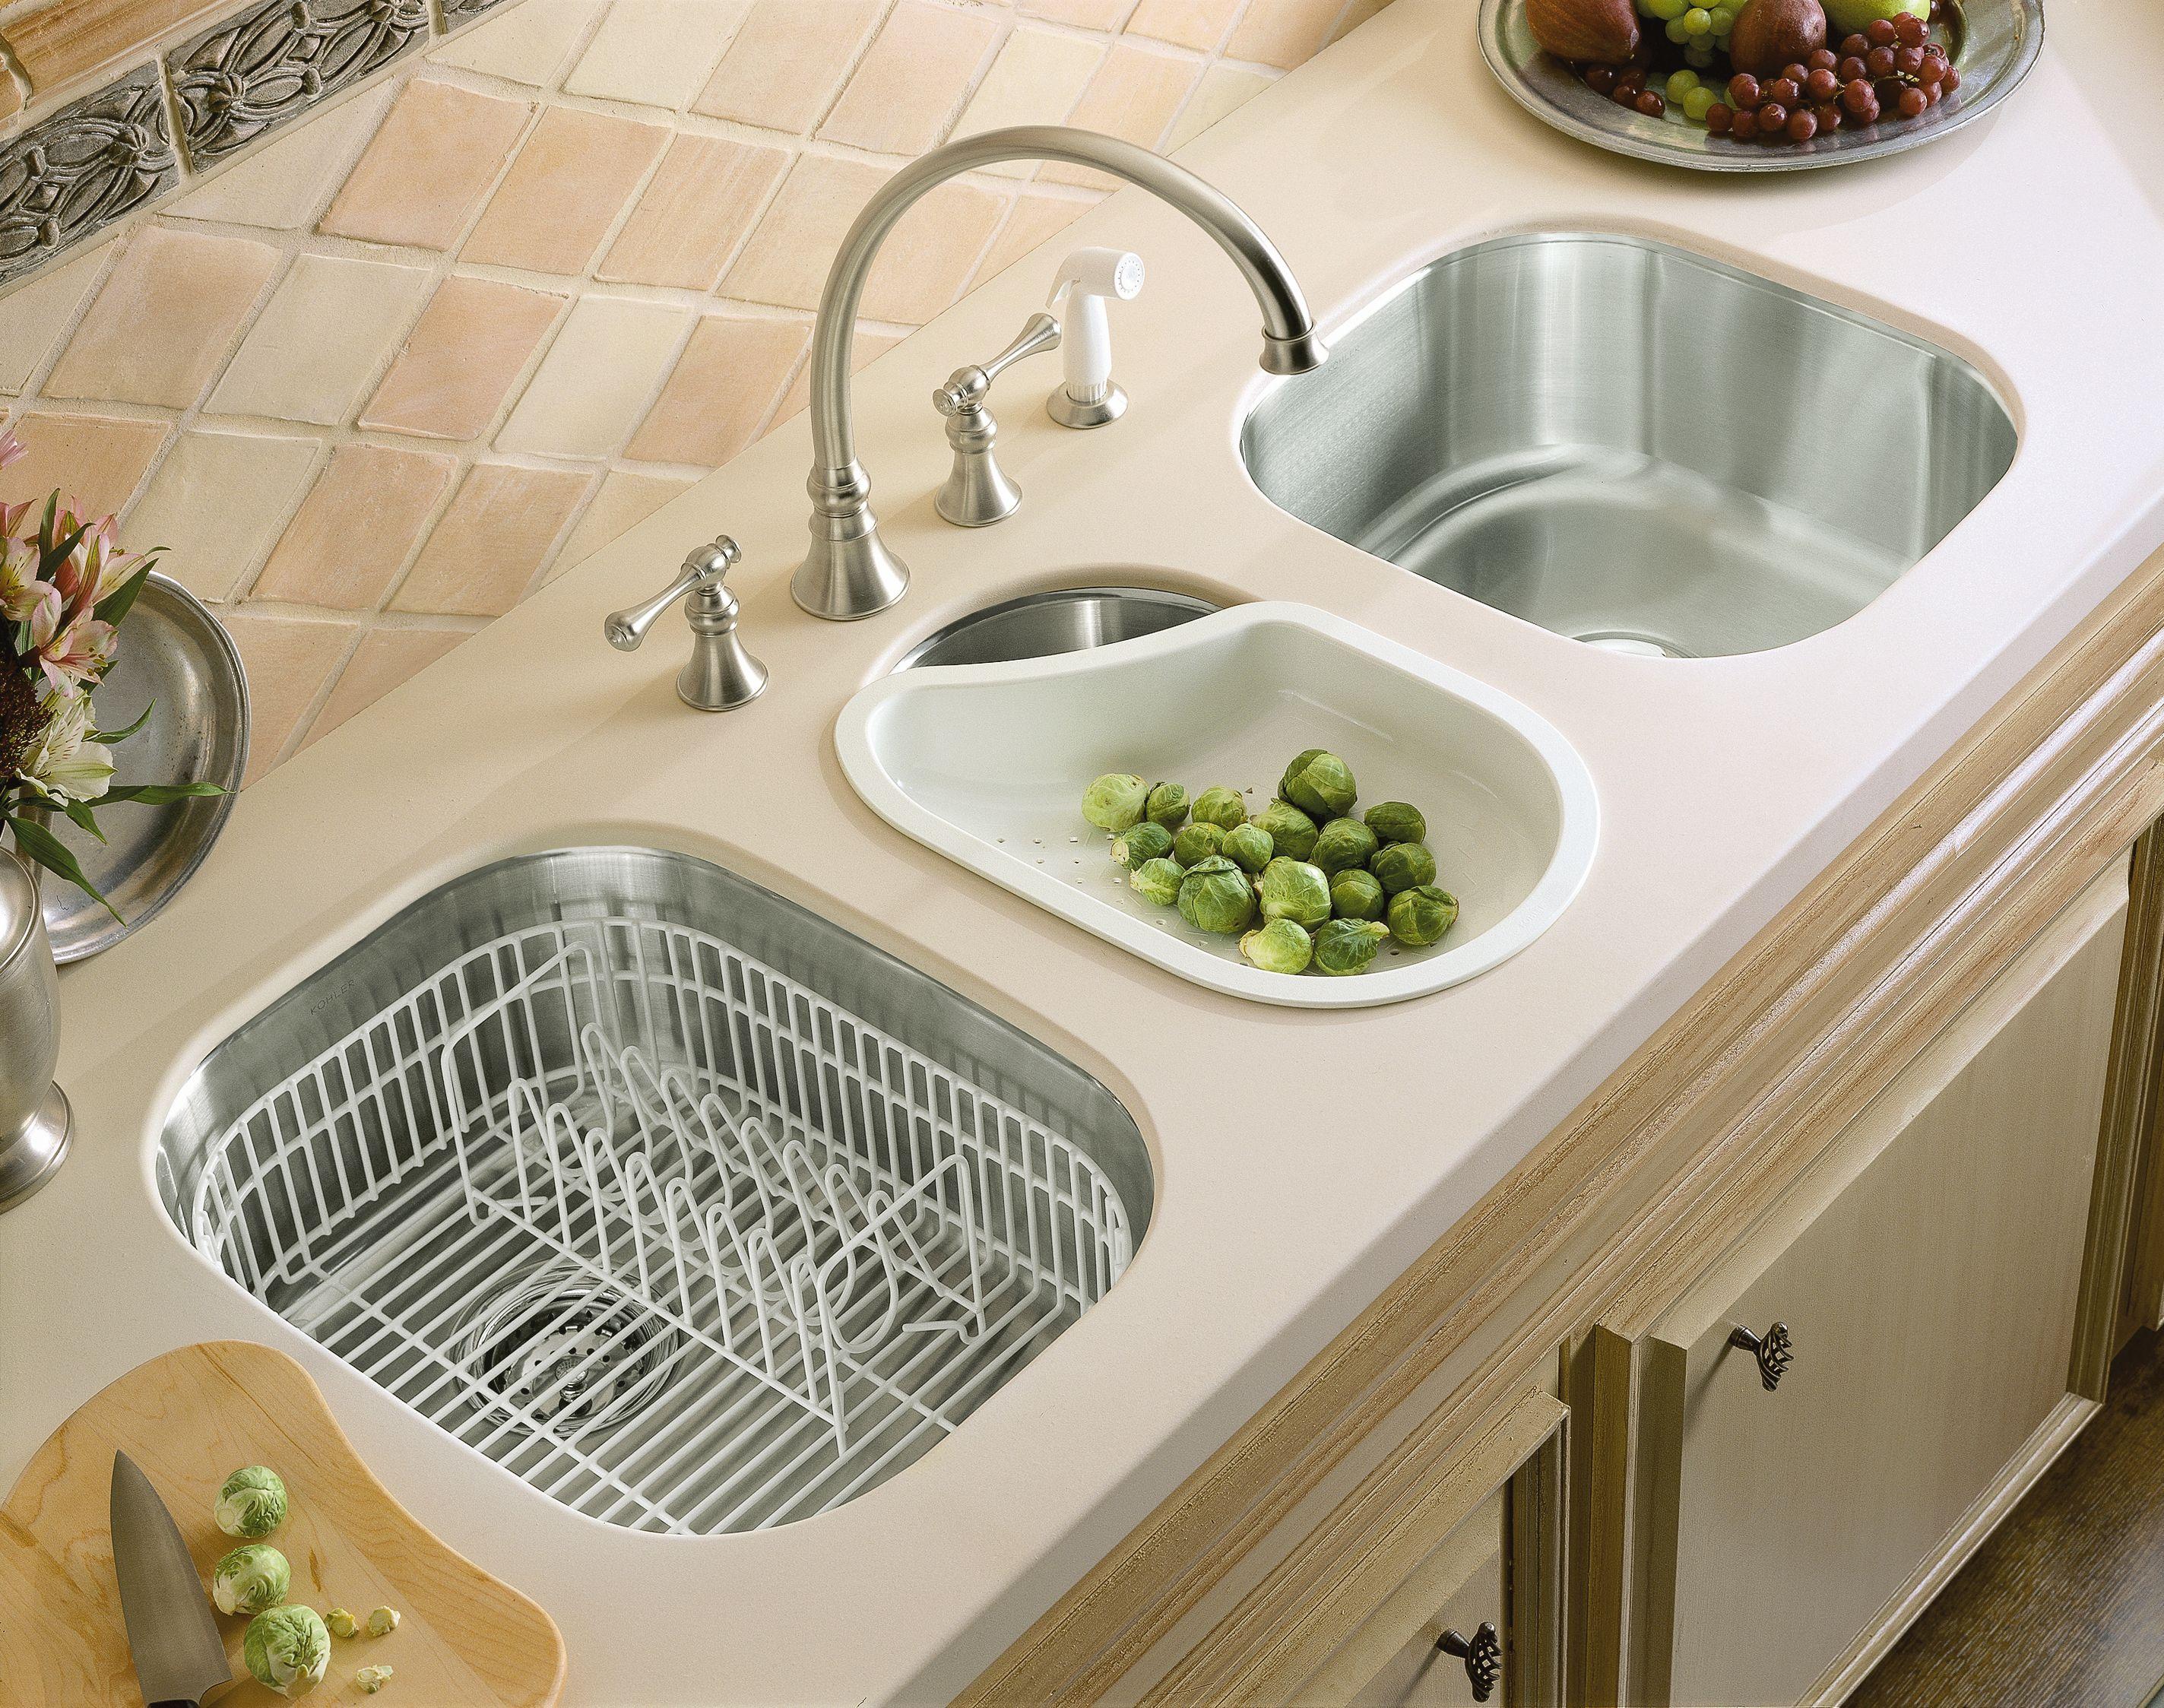 Kohler Build Com Kitchen Sink Design Kitchen Inspirations Simple Kitchen